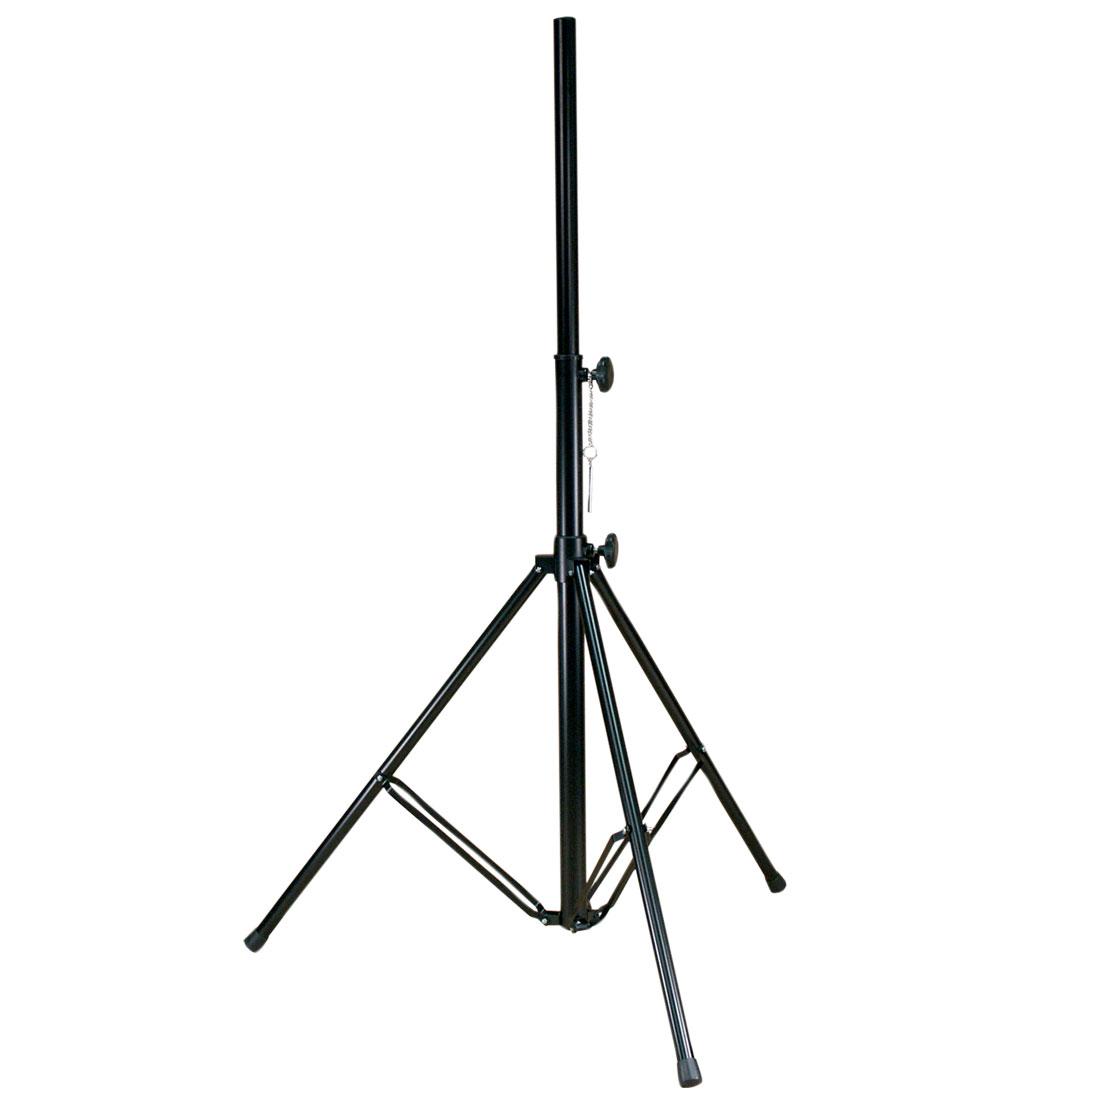 LSS-3S, PRO-speaker stand steel, black